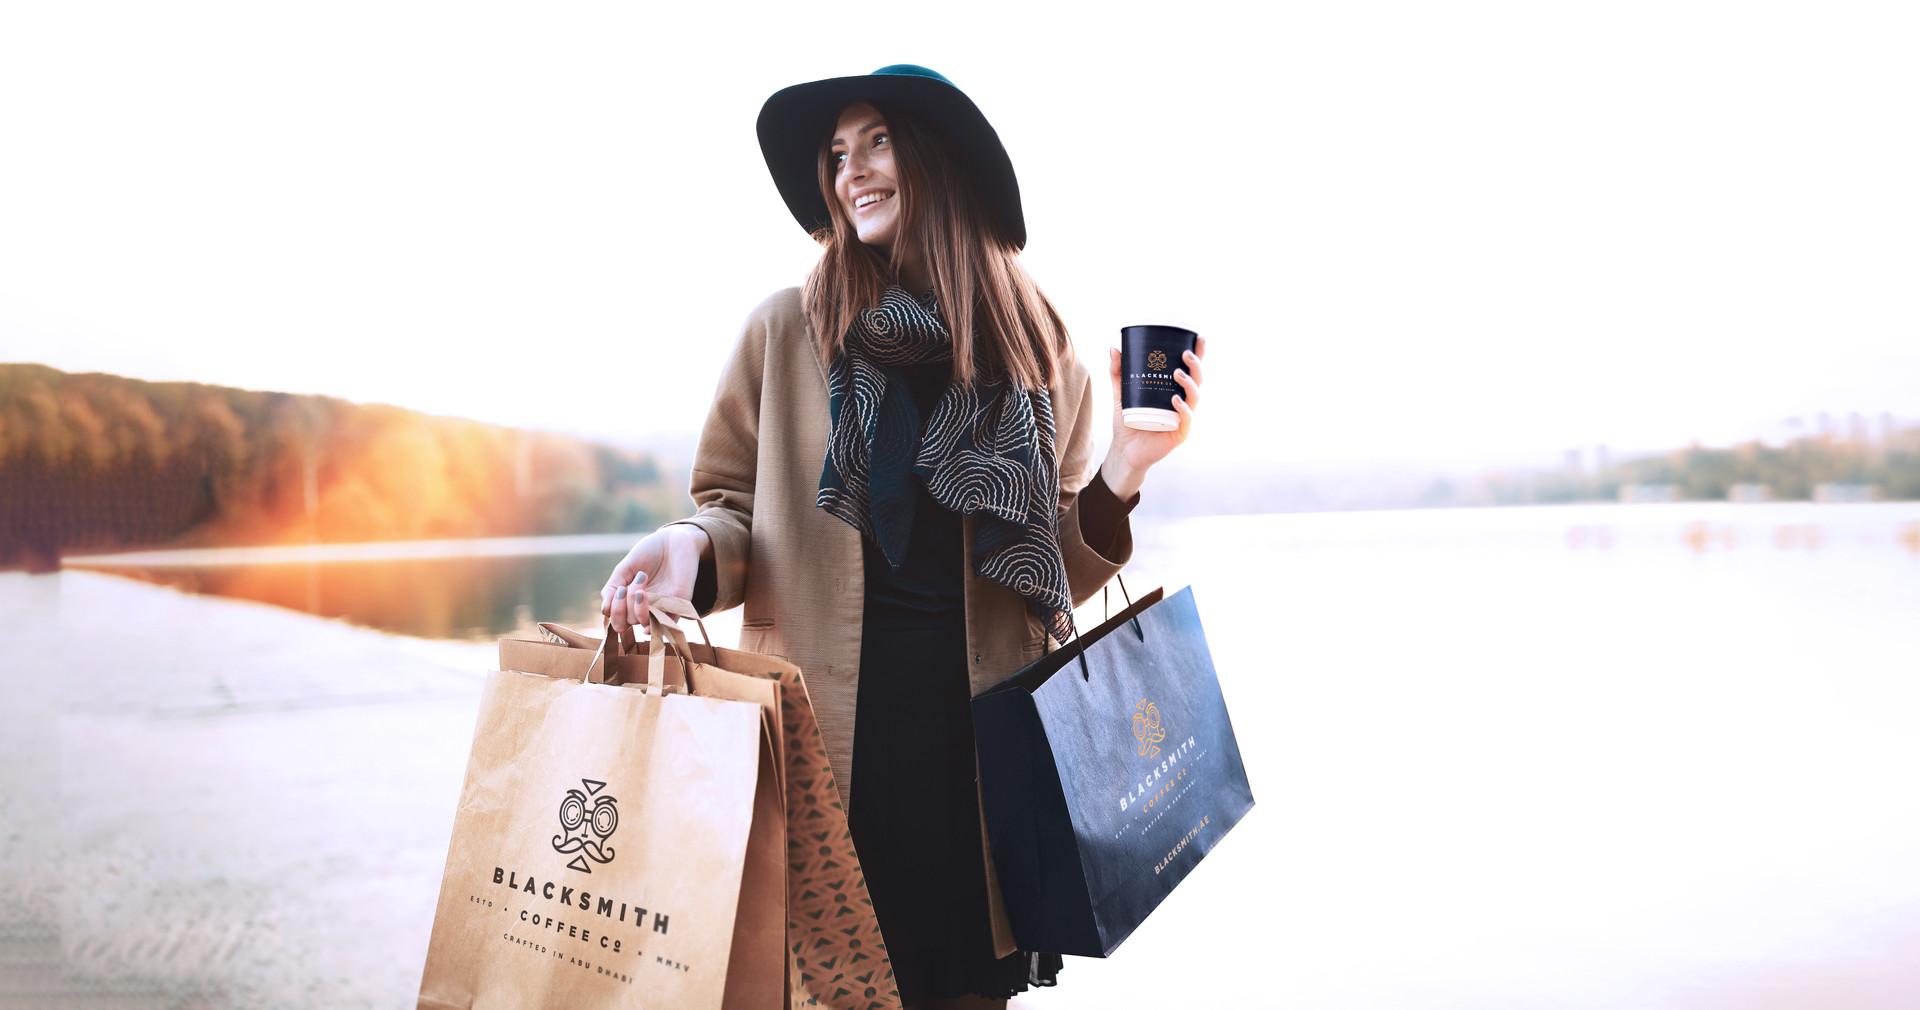 Blacksmith coffee-woman-shopping-bag.jpg